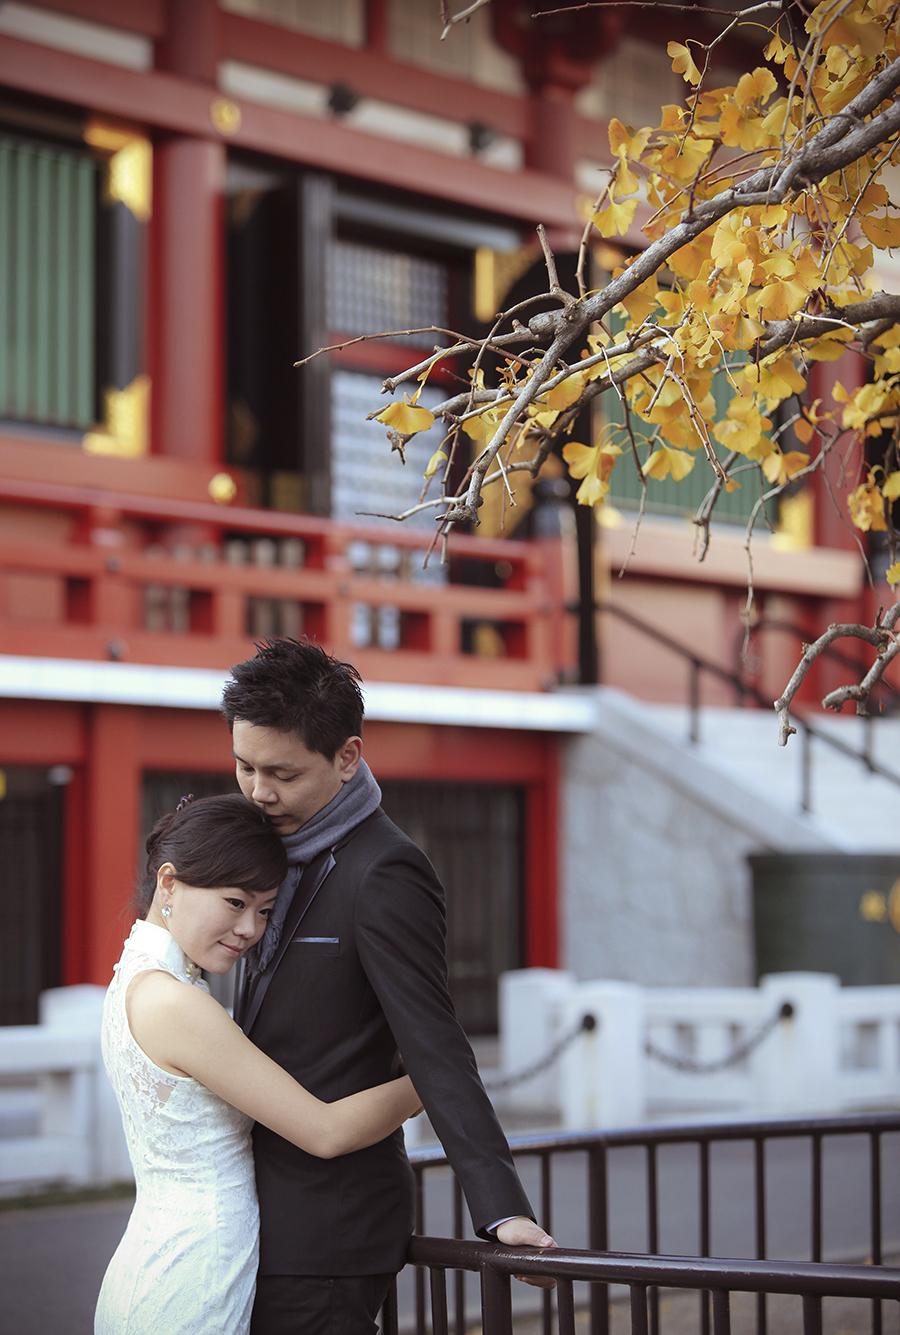 hokkaido tokyo japan . wedding photography by kurt ahs . 5078.jpg